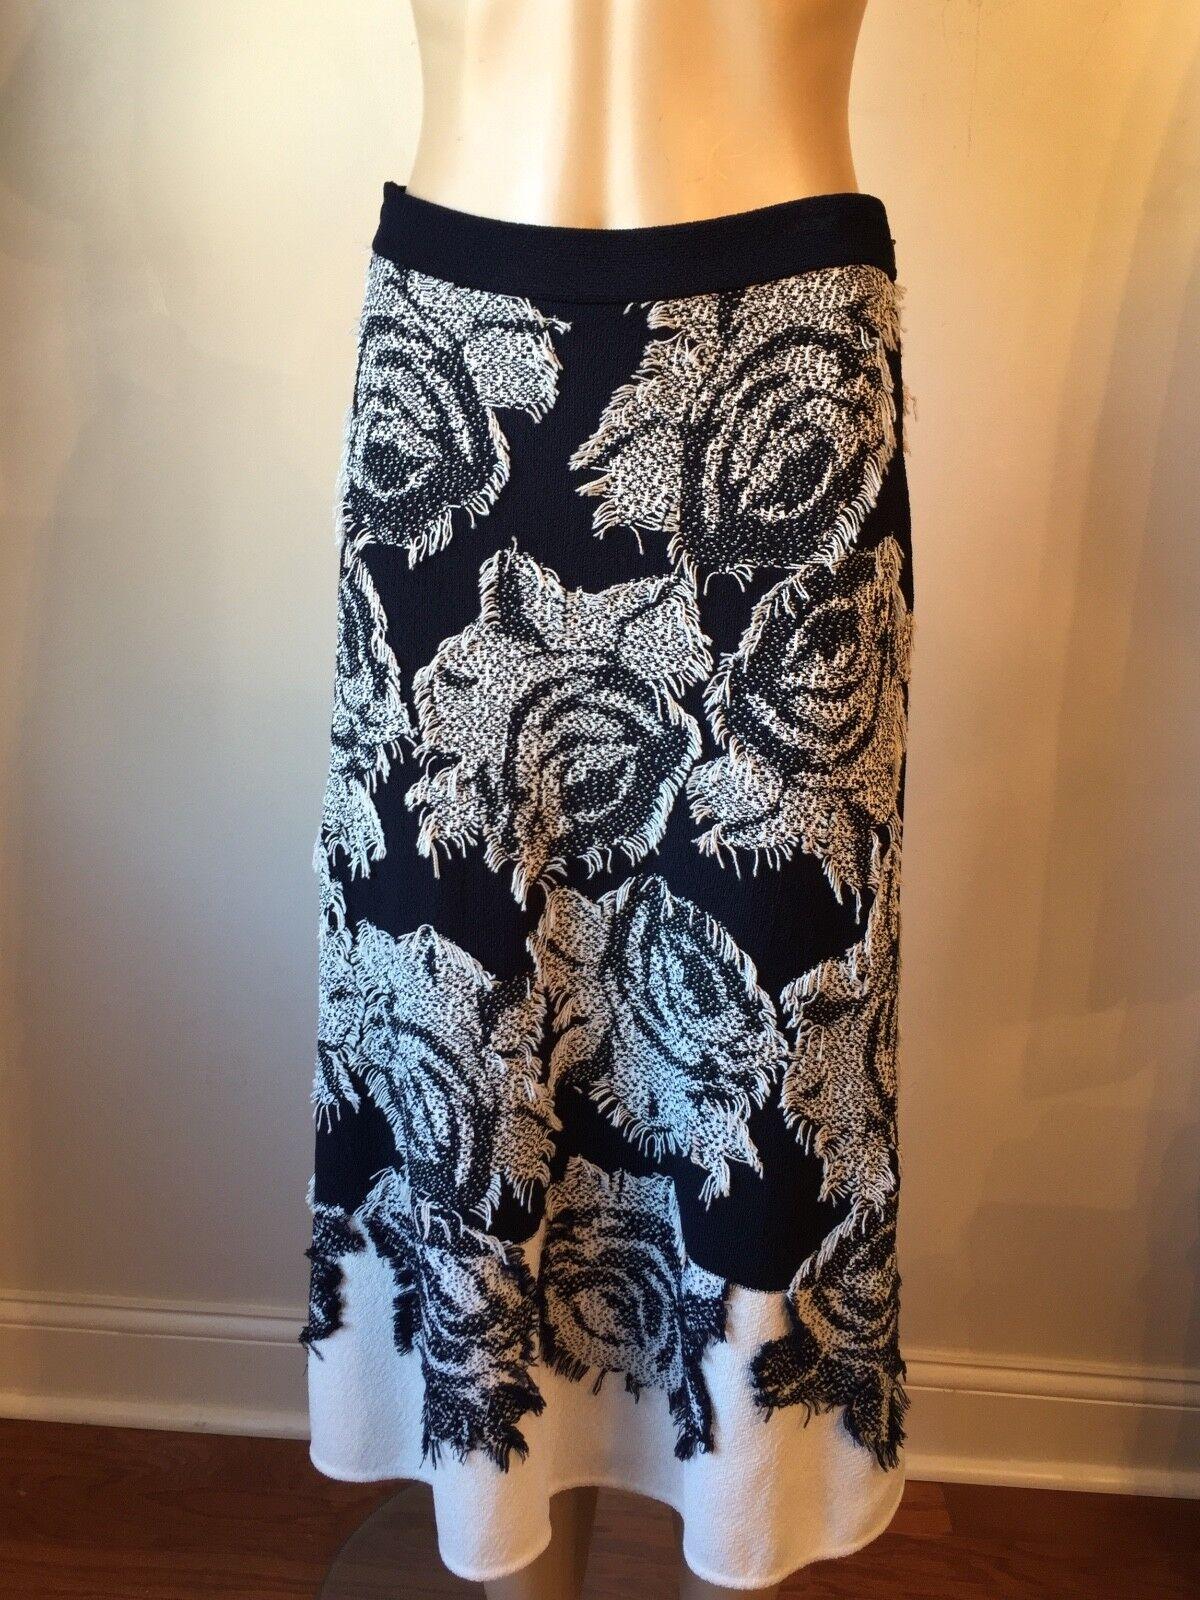 NWT St John knit skirt size 8 navy & white tweed